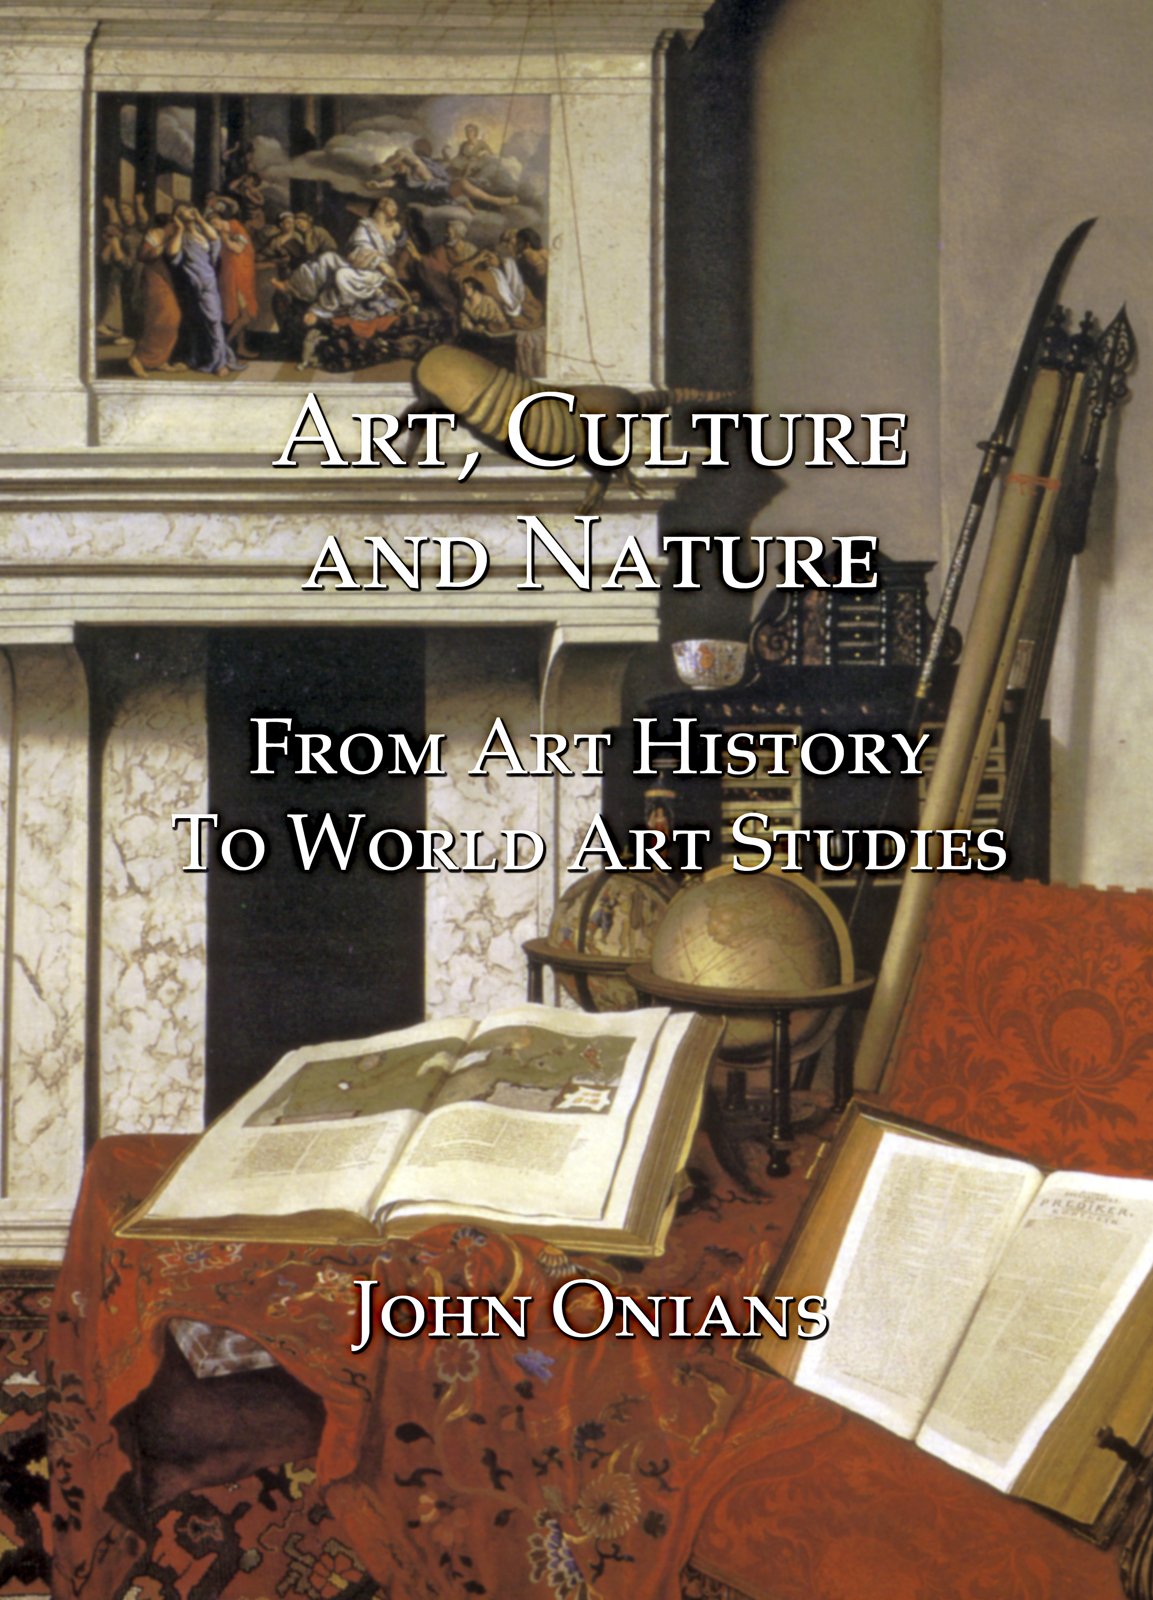 John Onians